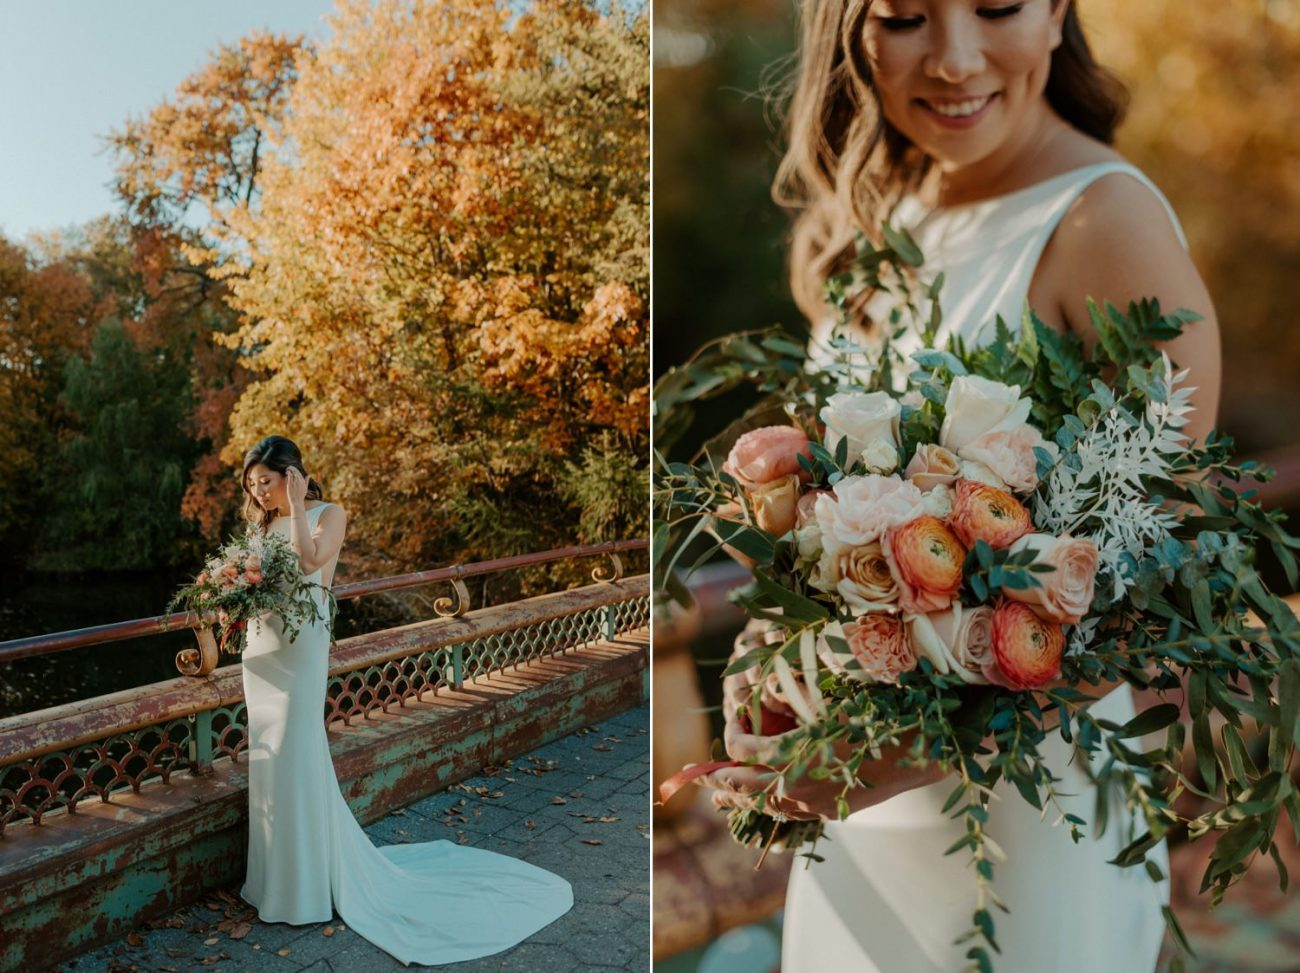 Prospect Park Brooklyn Wedding Fall Wedding In NYC New York Wedding Photographer Anais Possamai Photography 10